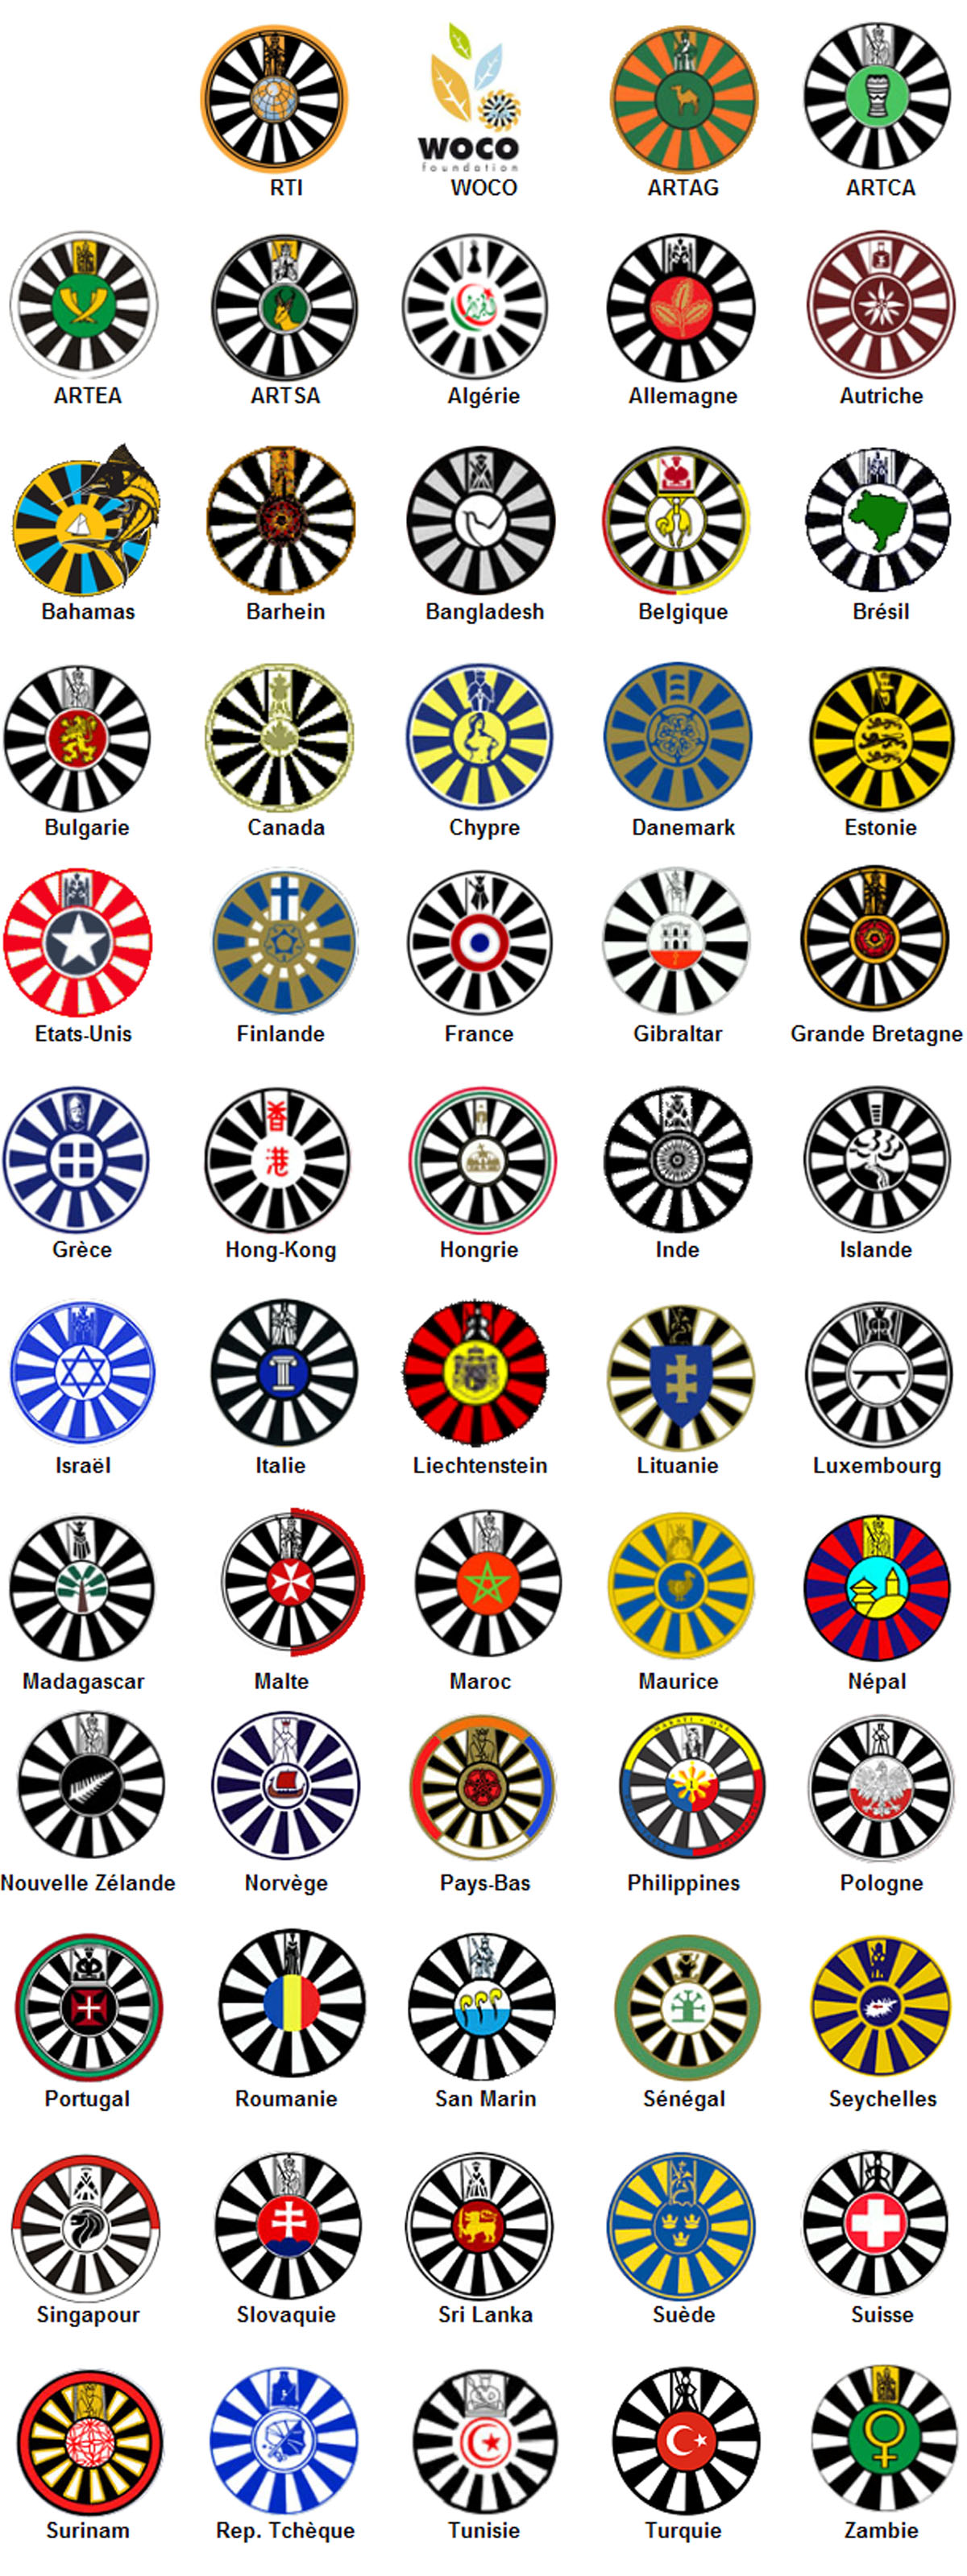 Tous les logos RTI